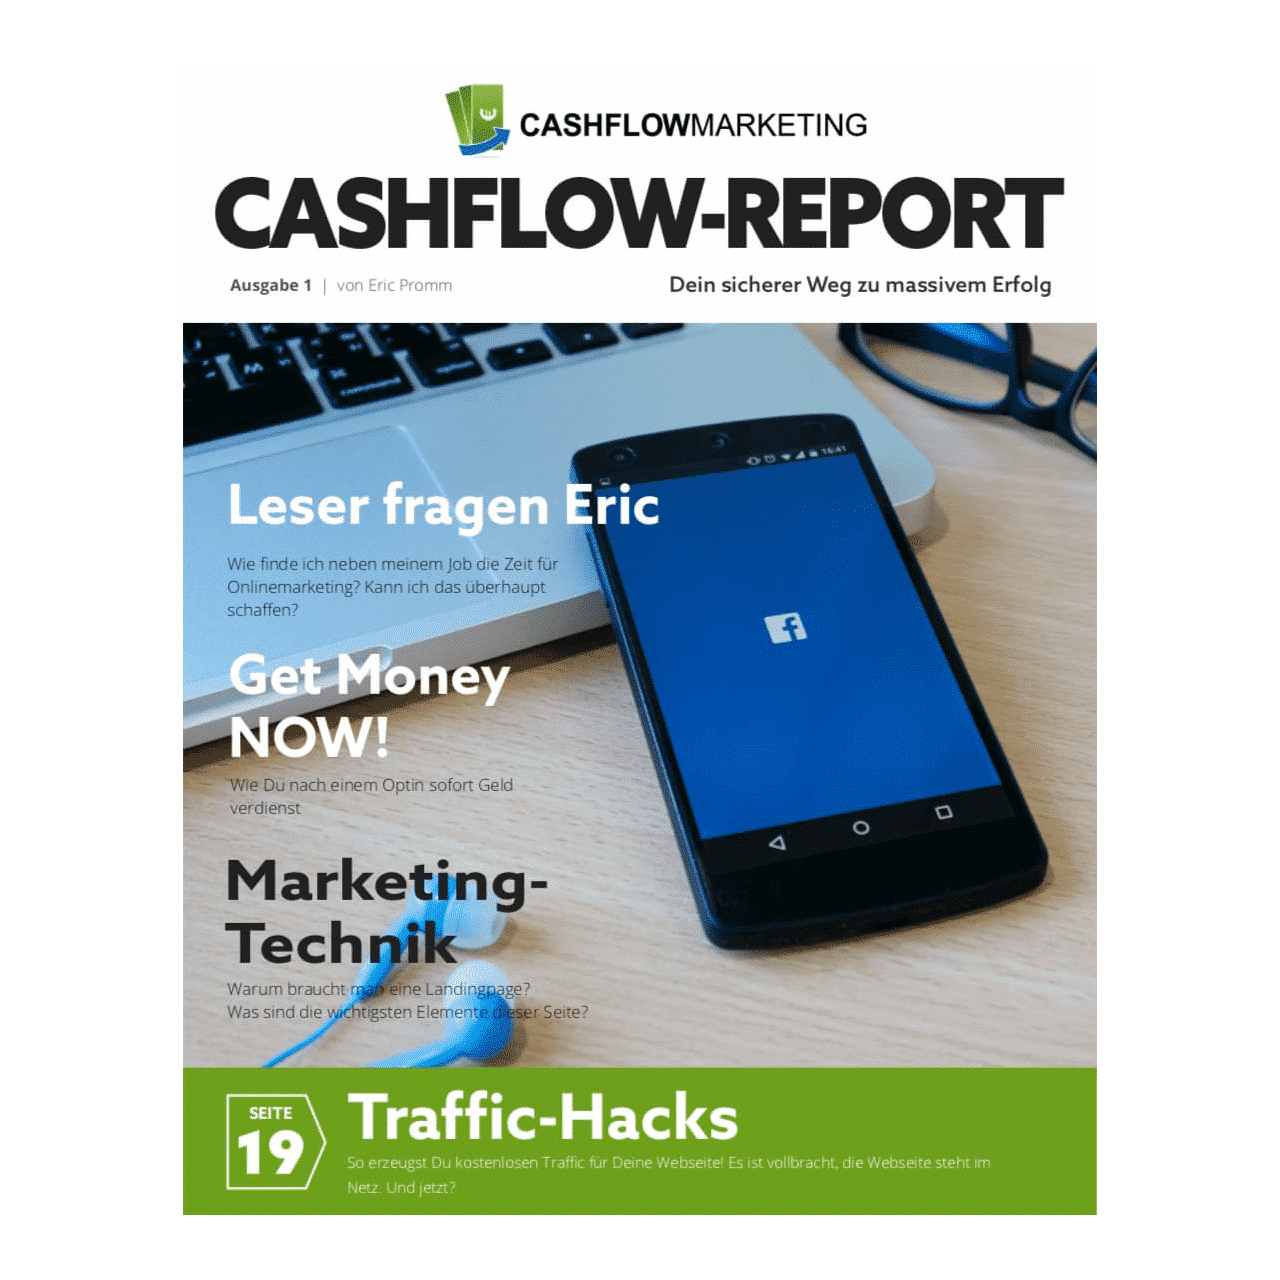 Cashflow Report (monatlich) by Eric Promm als PDF Dokument